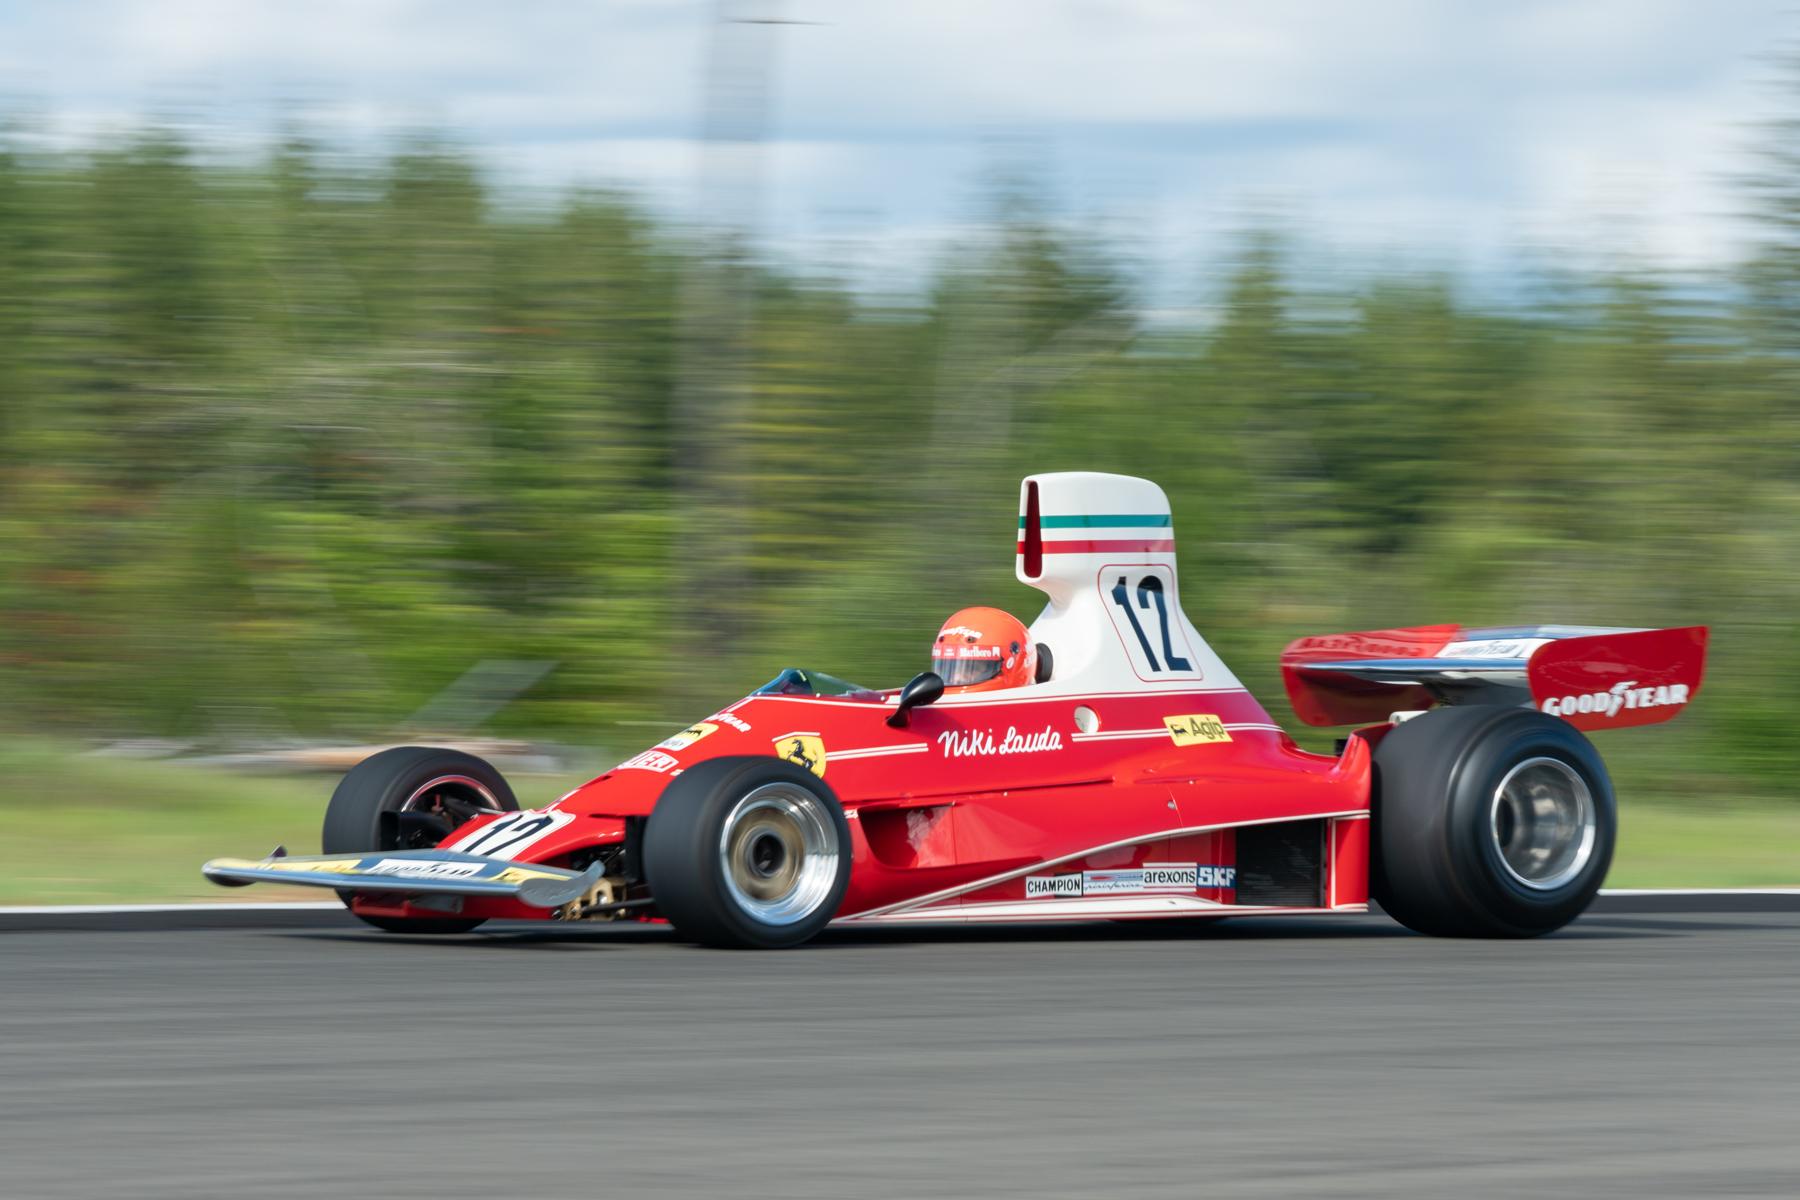 1975 Ferrari 312T racing